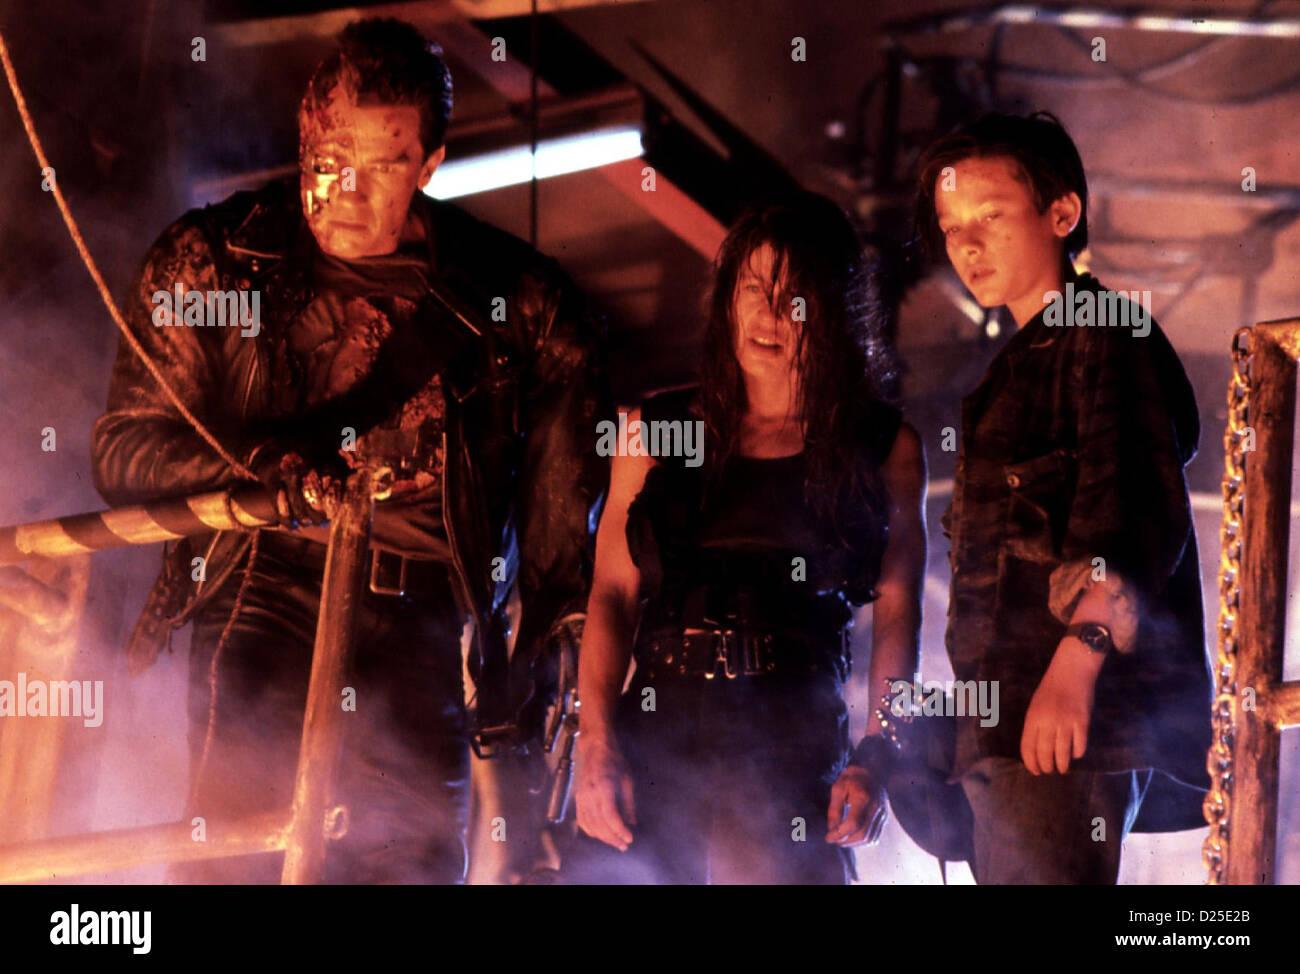 Terminator Ii - Tag Der Abrechnung  Terminator 2: Judgement Day  Arnold Schwarzenegger, Linda Hamilton, Edward Furlong - Stock Image